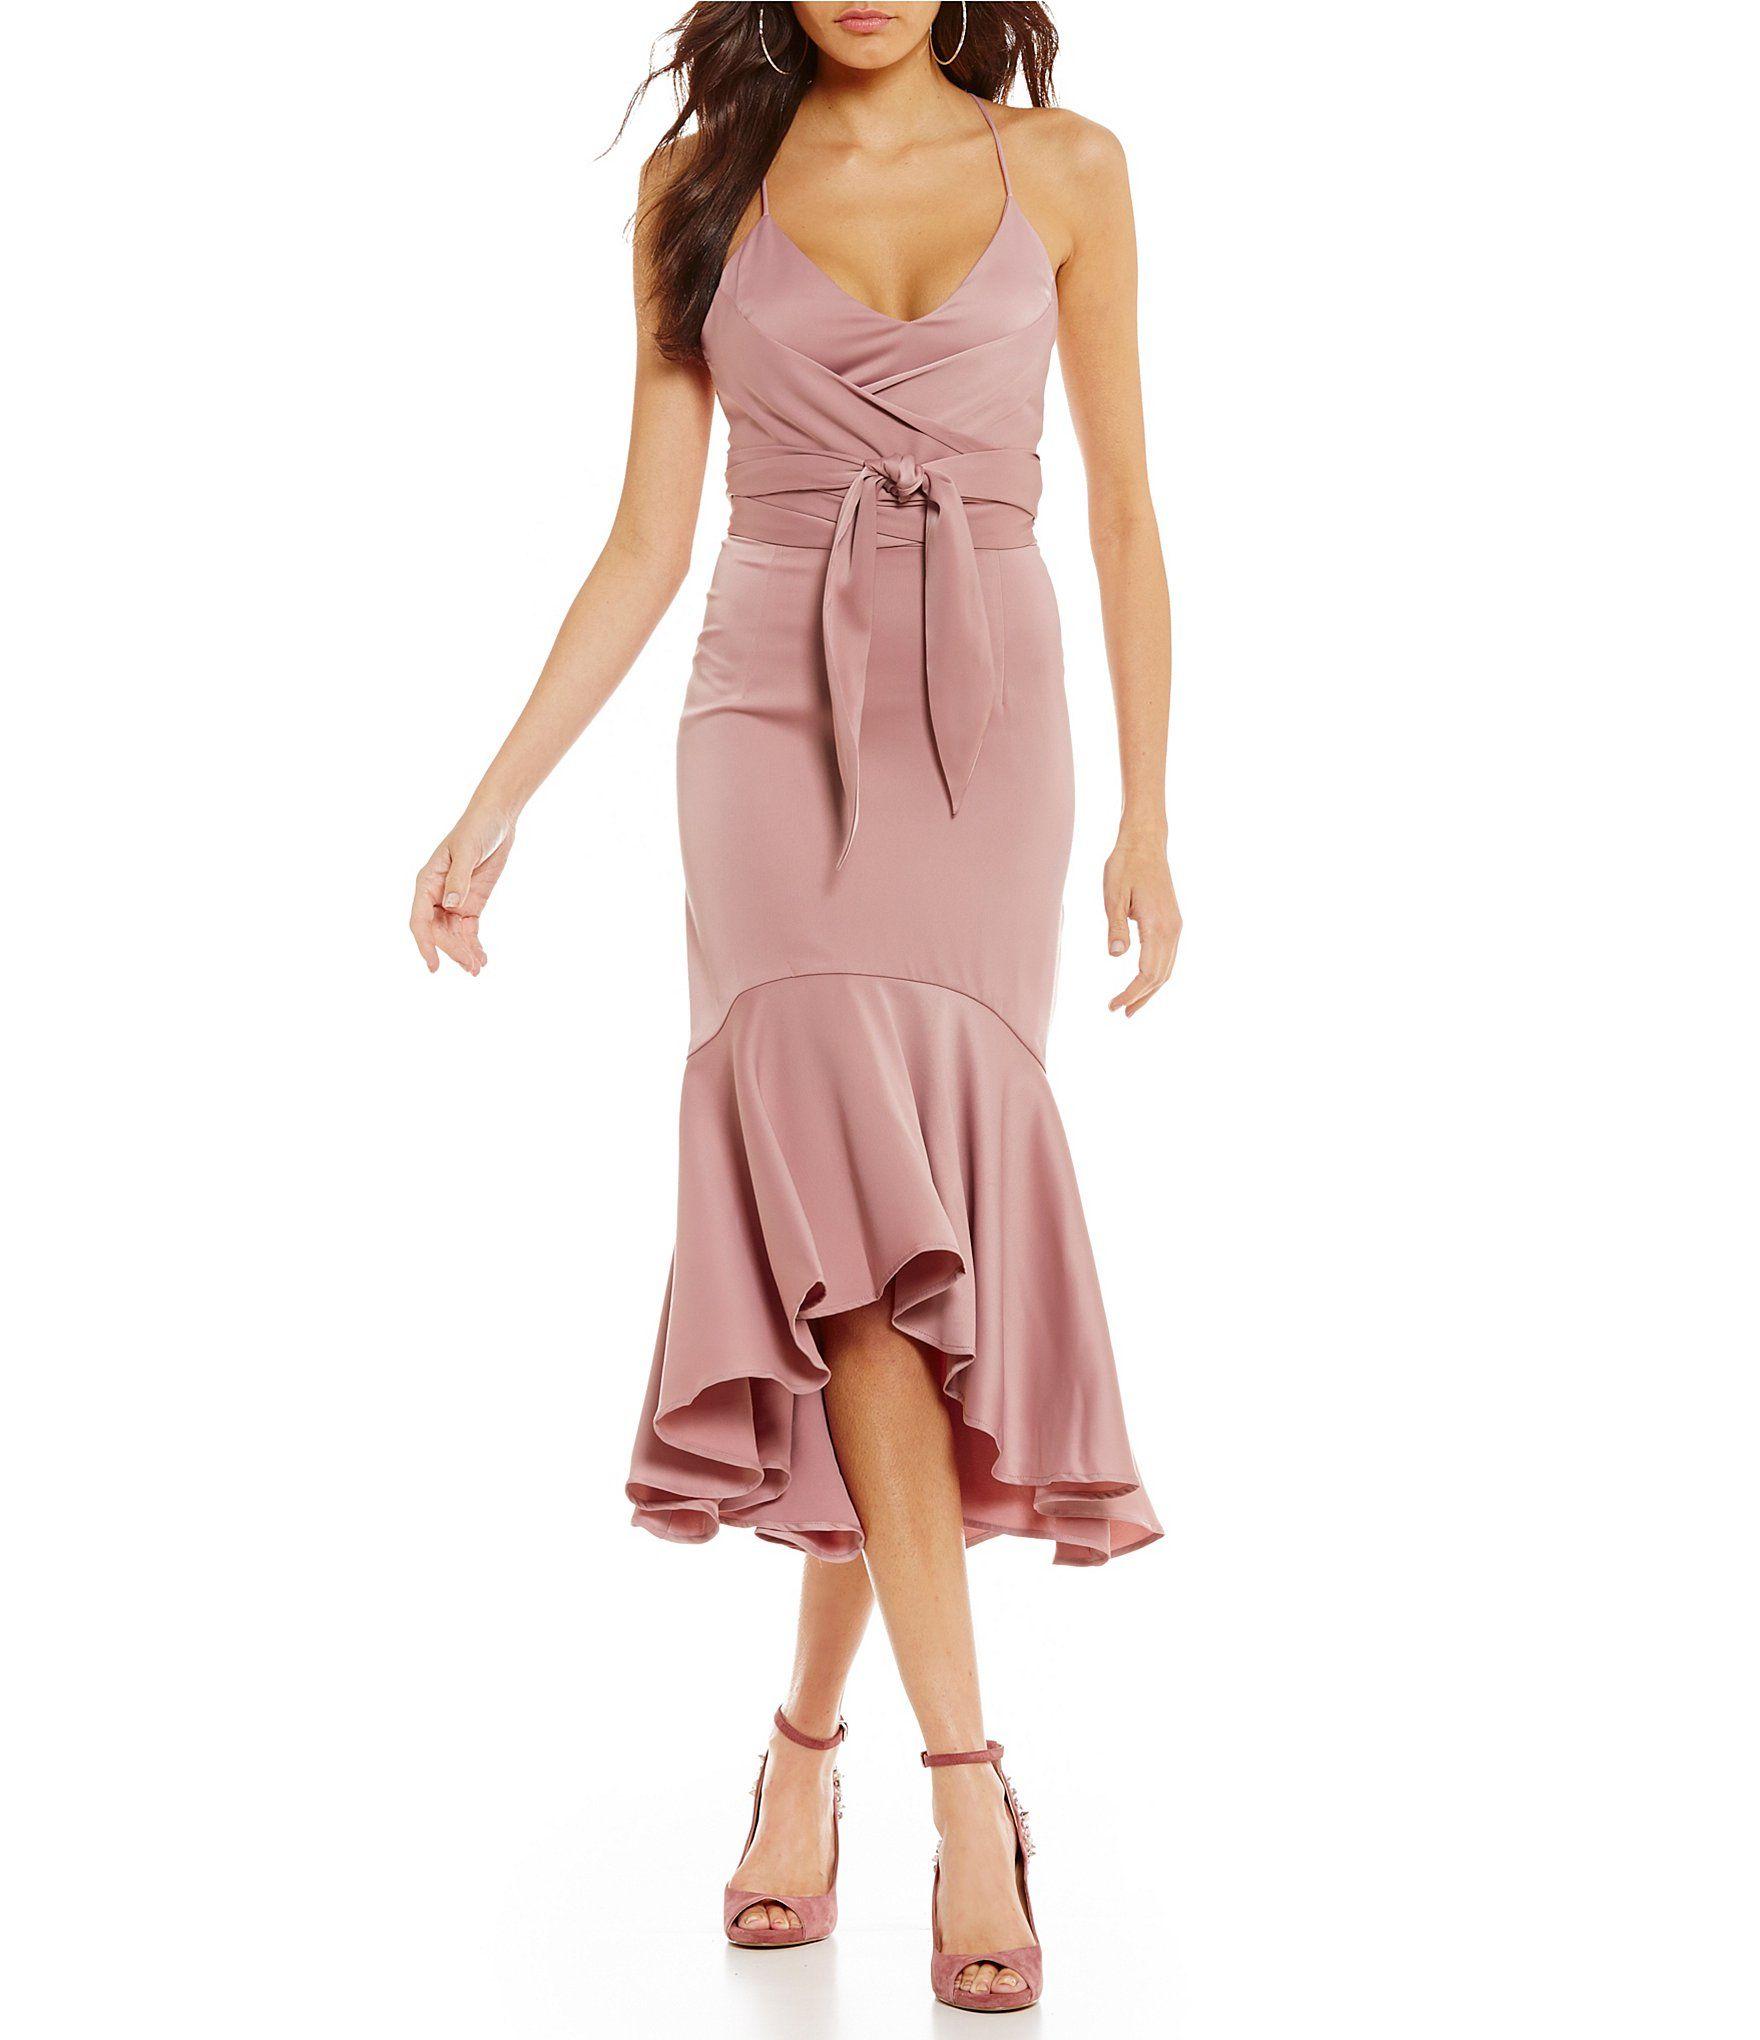 Gianni Bini Melinda Satin Wrap Dress #Dillards | Fashion - Spring ...